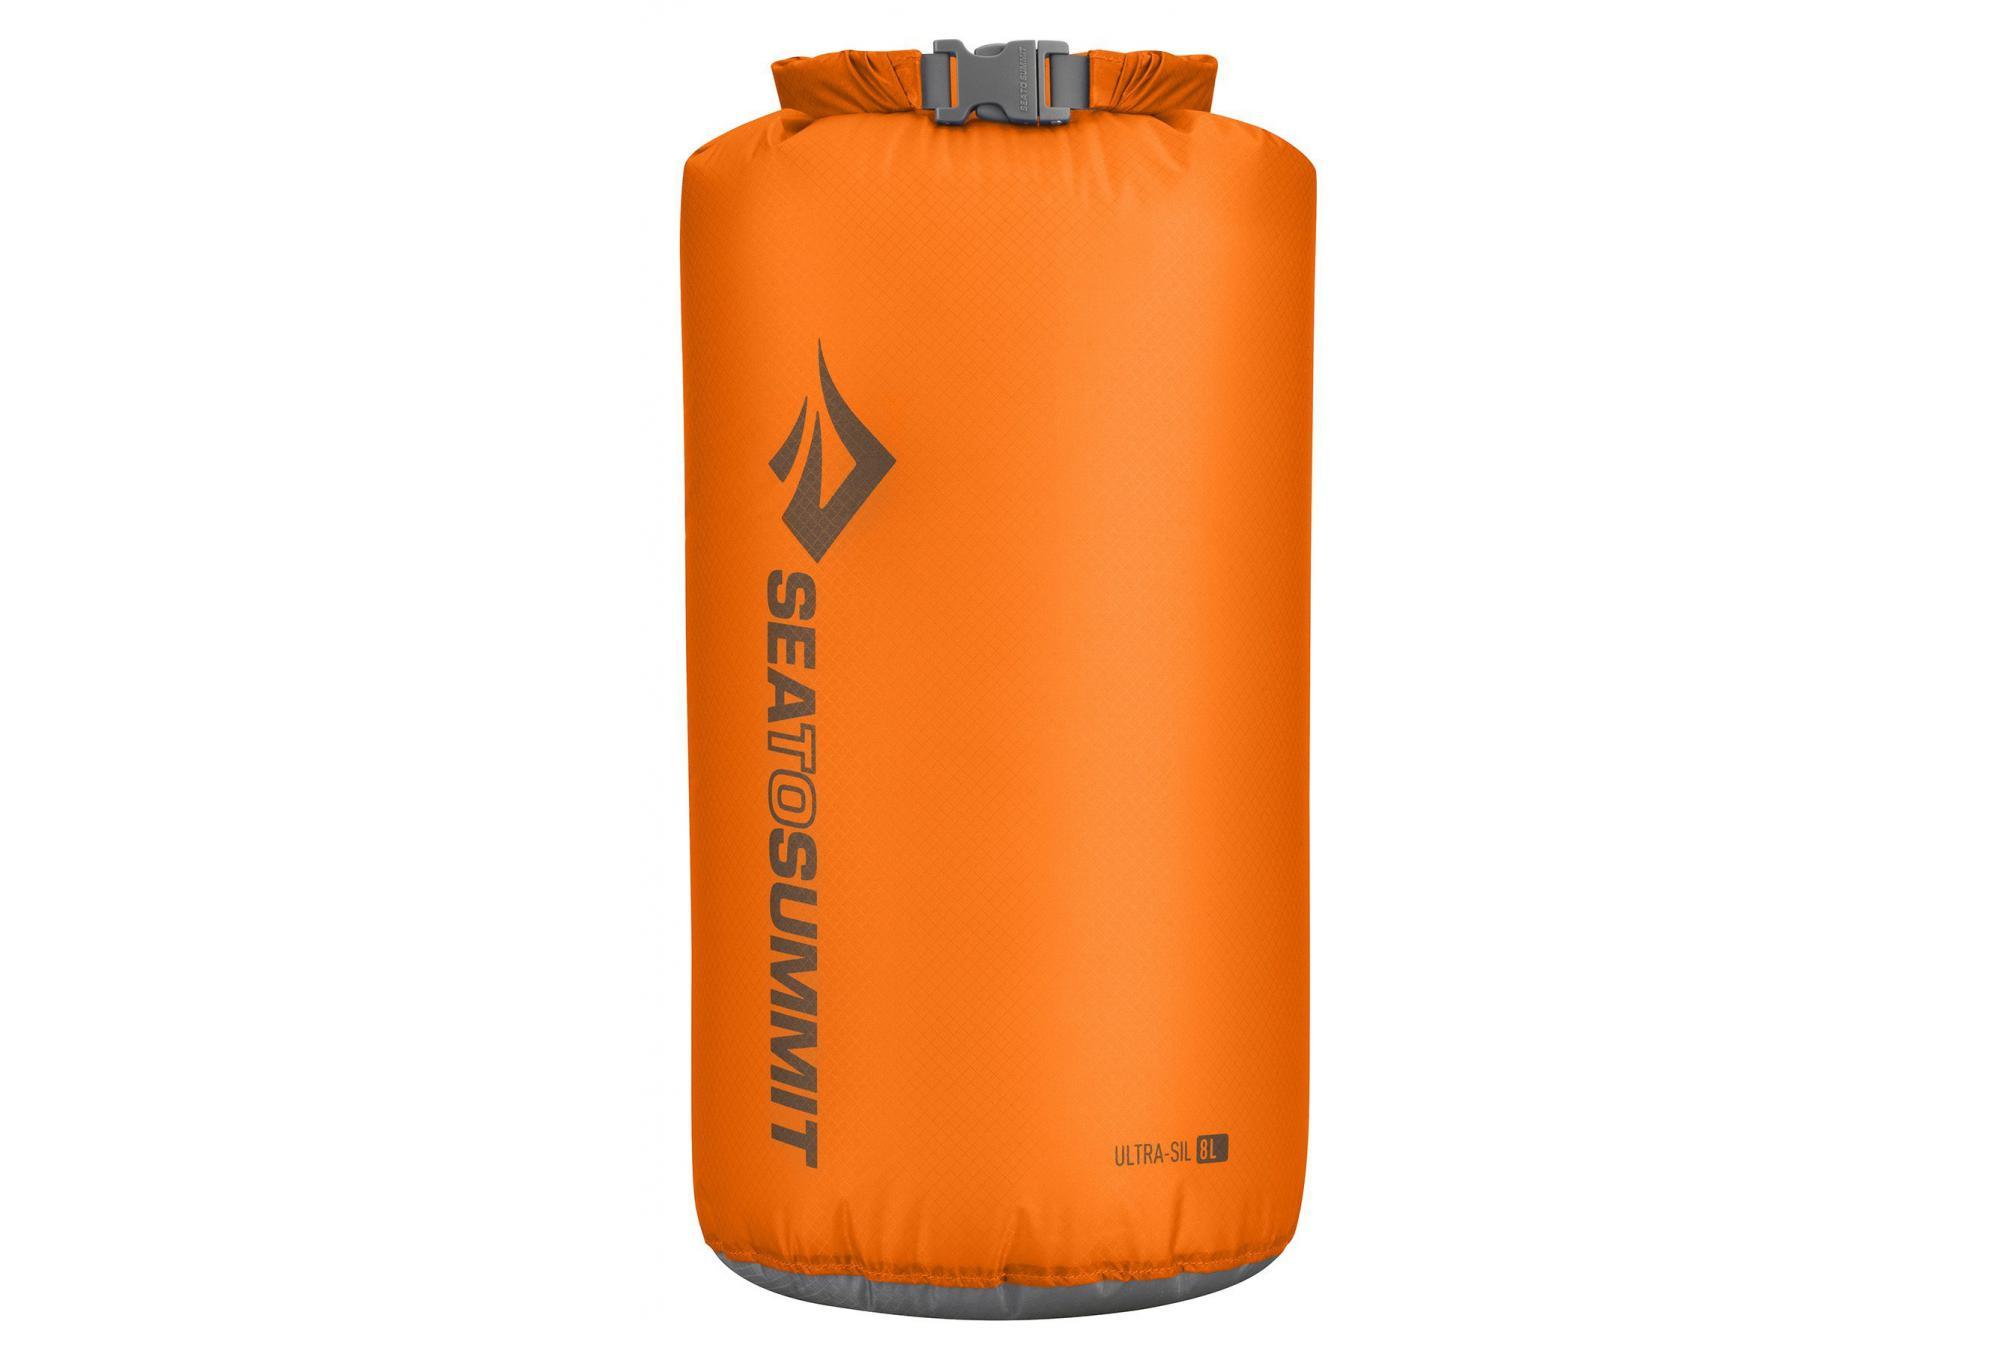 e88f8a853a Sac étanche ultra léger 8L Sea to Summit Ultra Sil Orange   Alltricks.fr